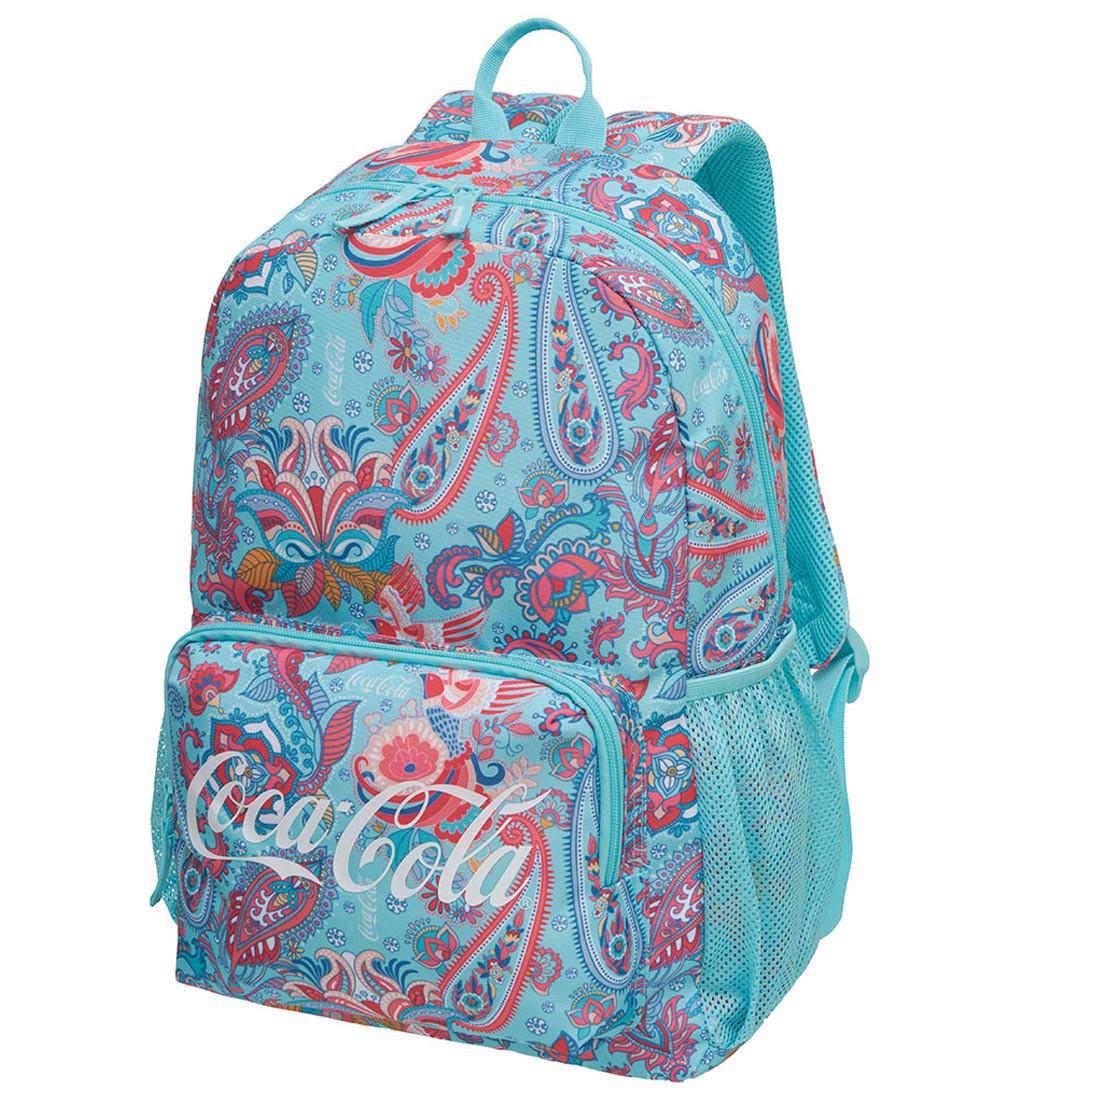 Mochila Feminina Coca Cola Folk